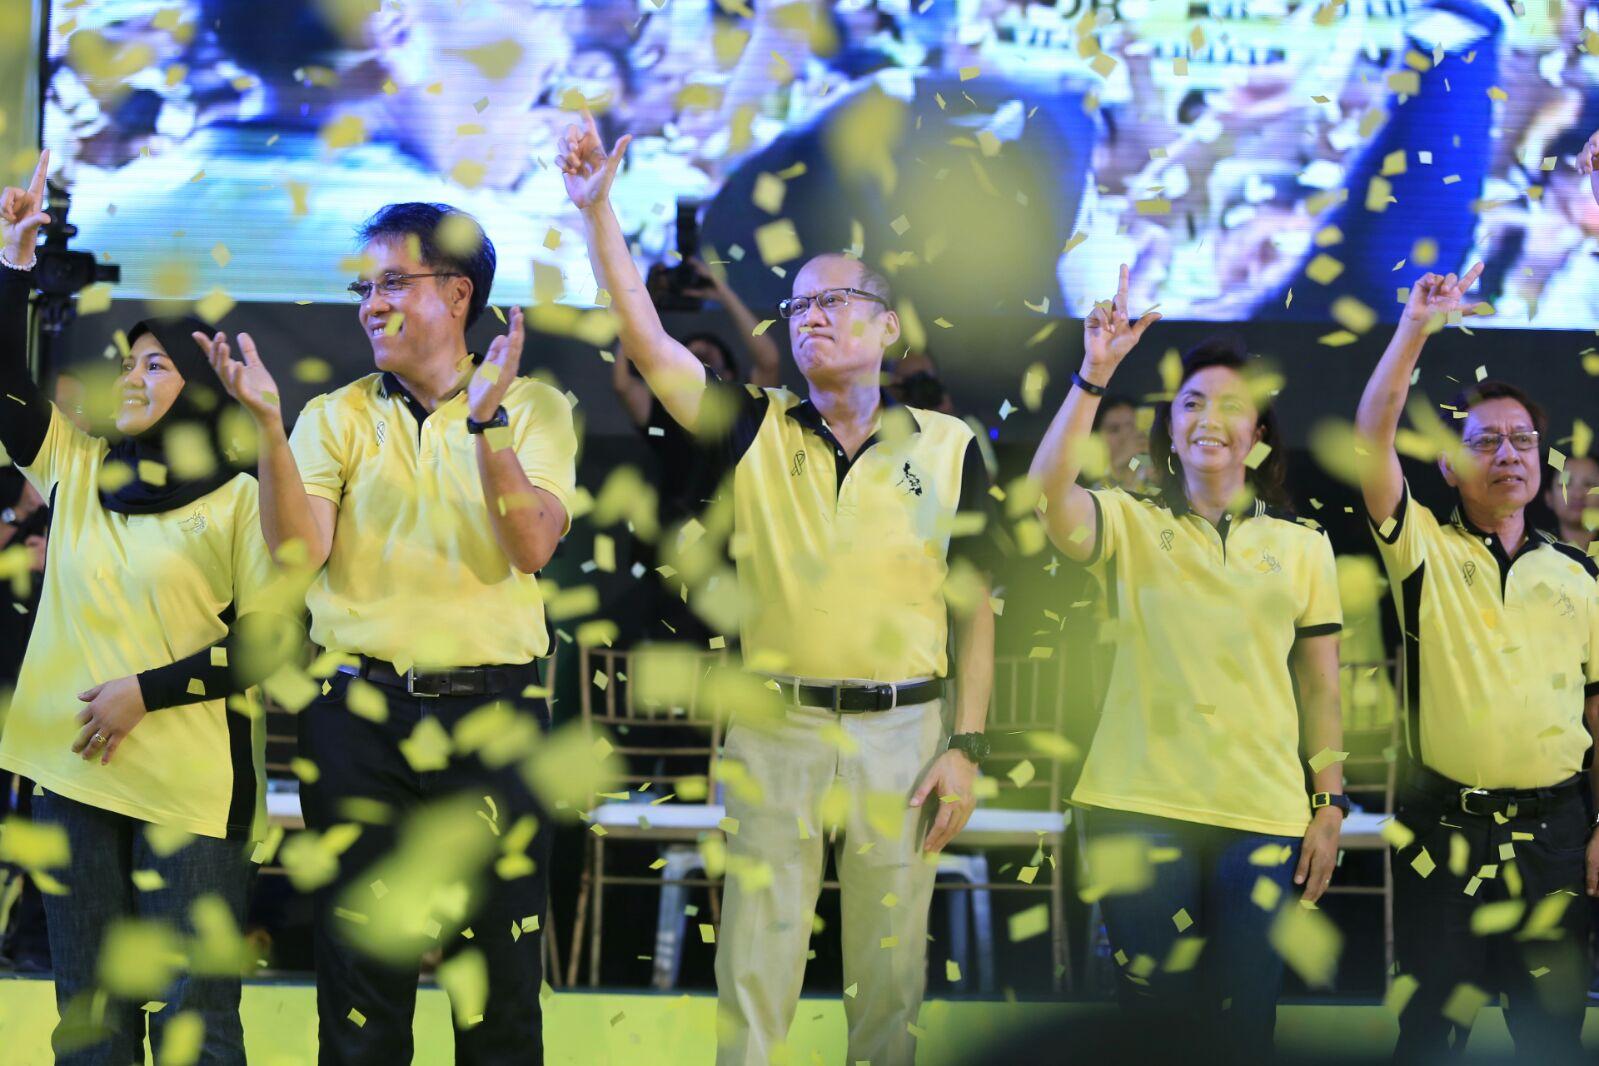 Pres. Benigno Aquino III launch the Roxas-Robredo campaign in Capiz on Feb. 9, 2016. Photo courtesy of the Malacanang Photo Bureau